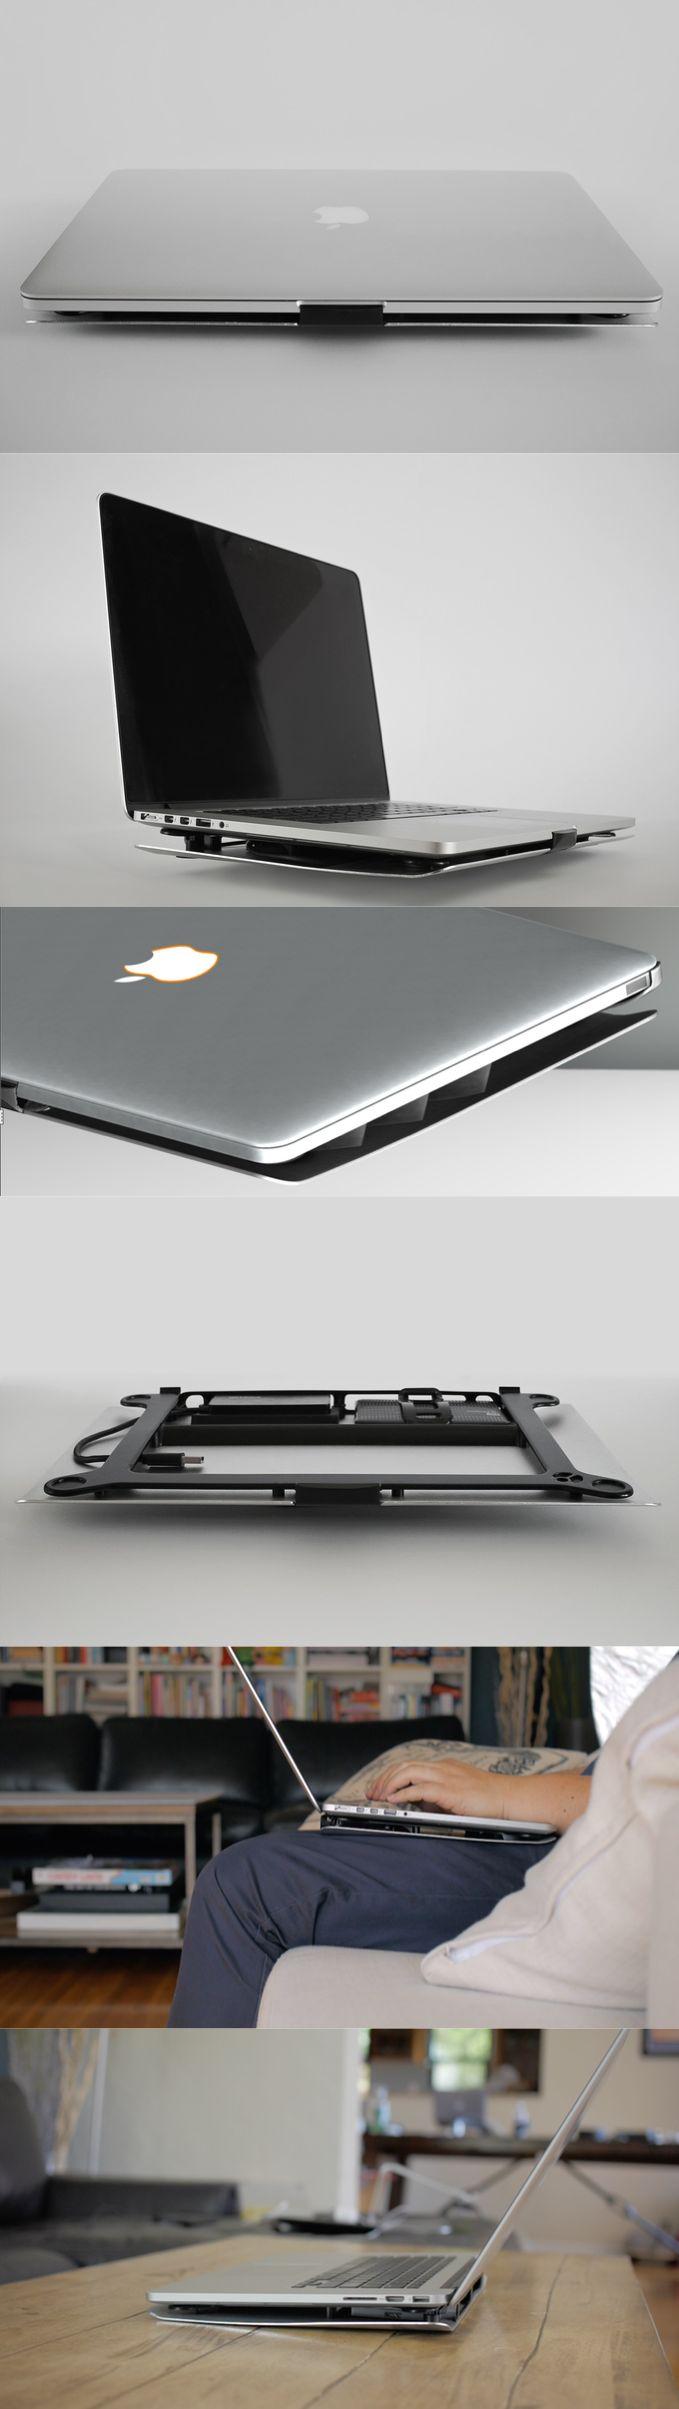 TILT Retina: Ultimate Cooling for the MacBook Pro Retina